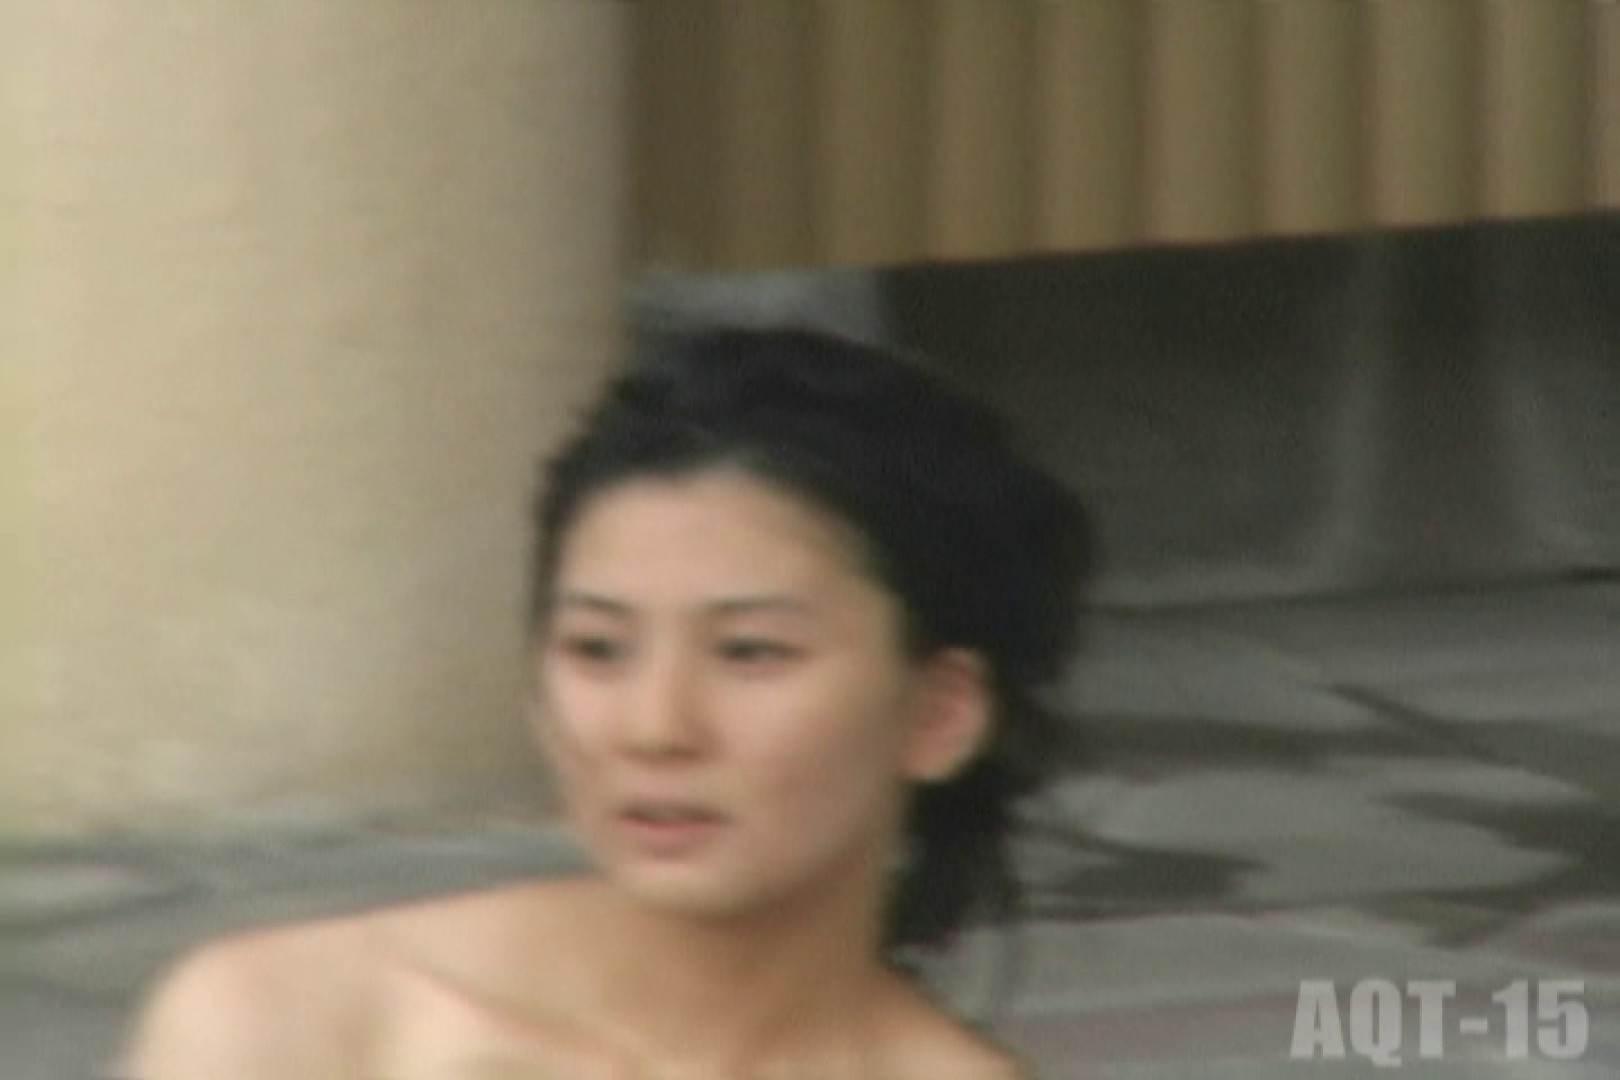 Aquaな露天風呂Vol.832 美しいOLの裸体 戯れ無修正画像 99pic 44